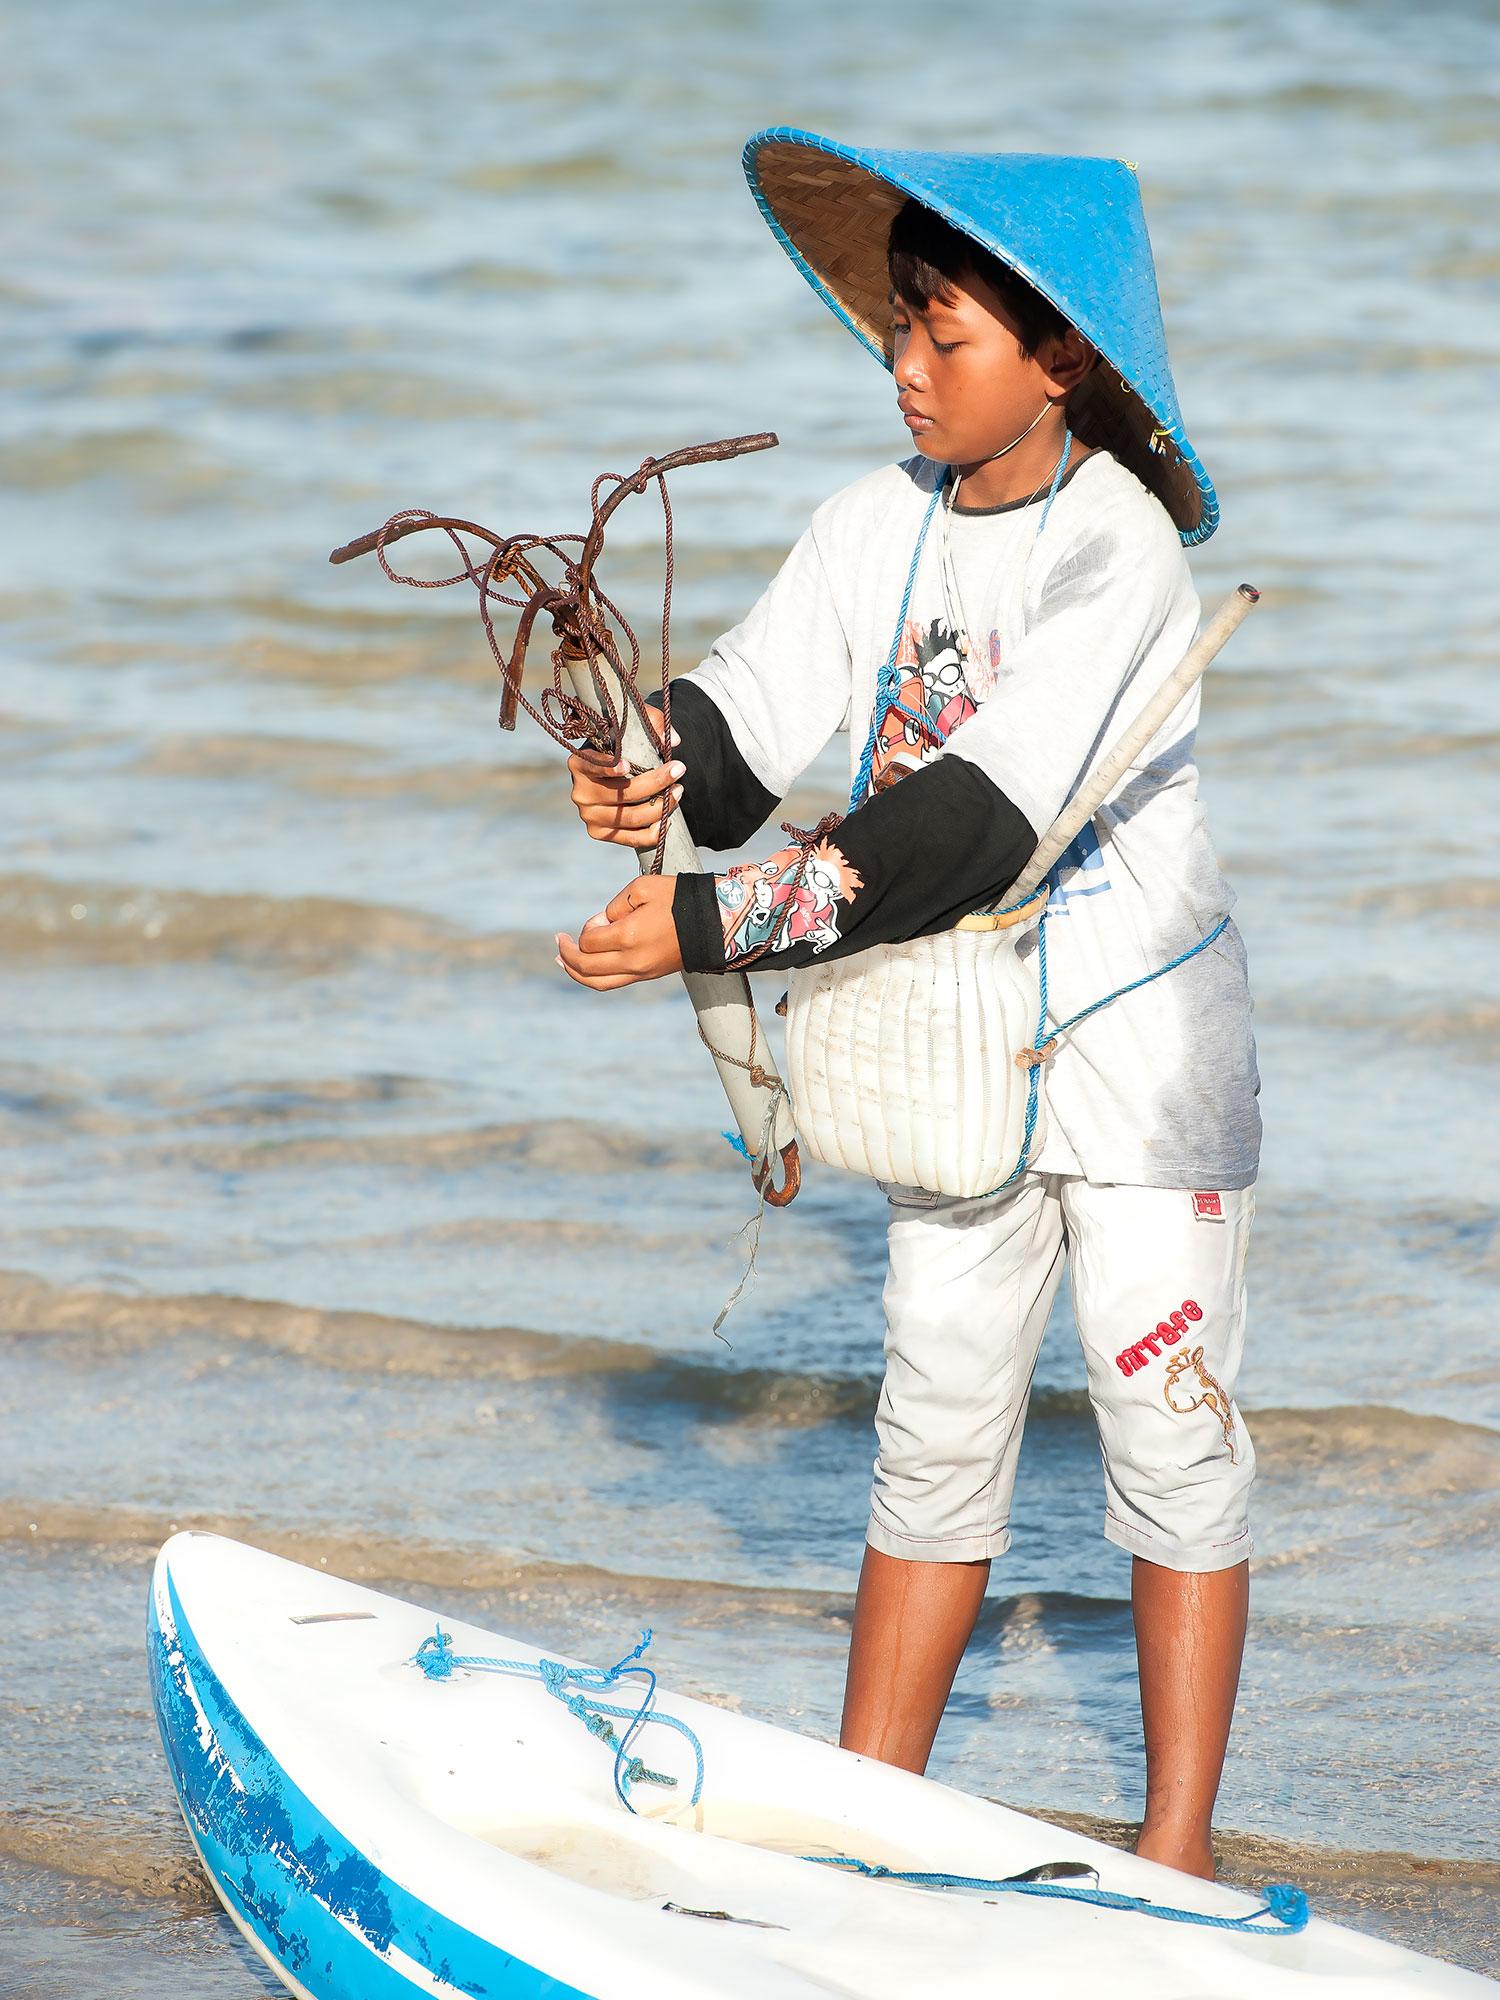 Bali fishing boy